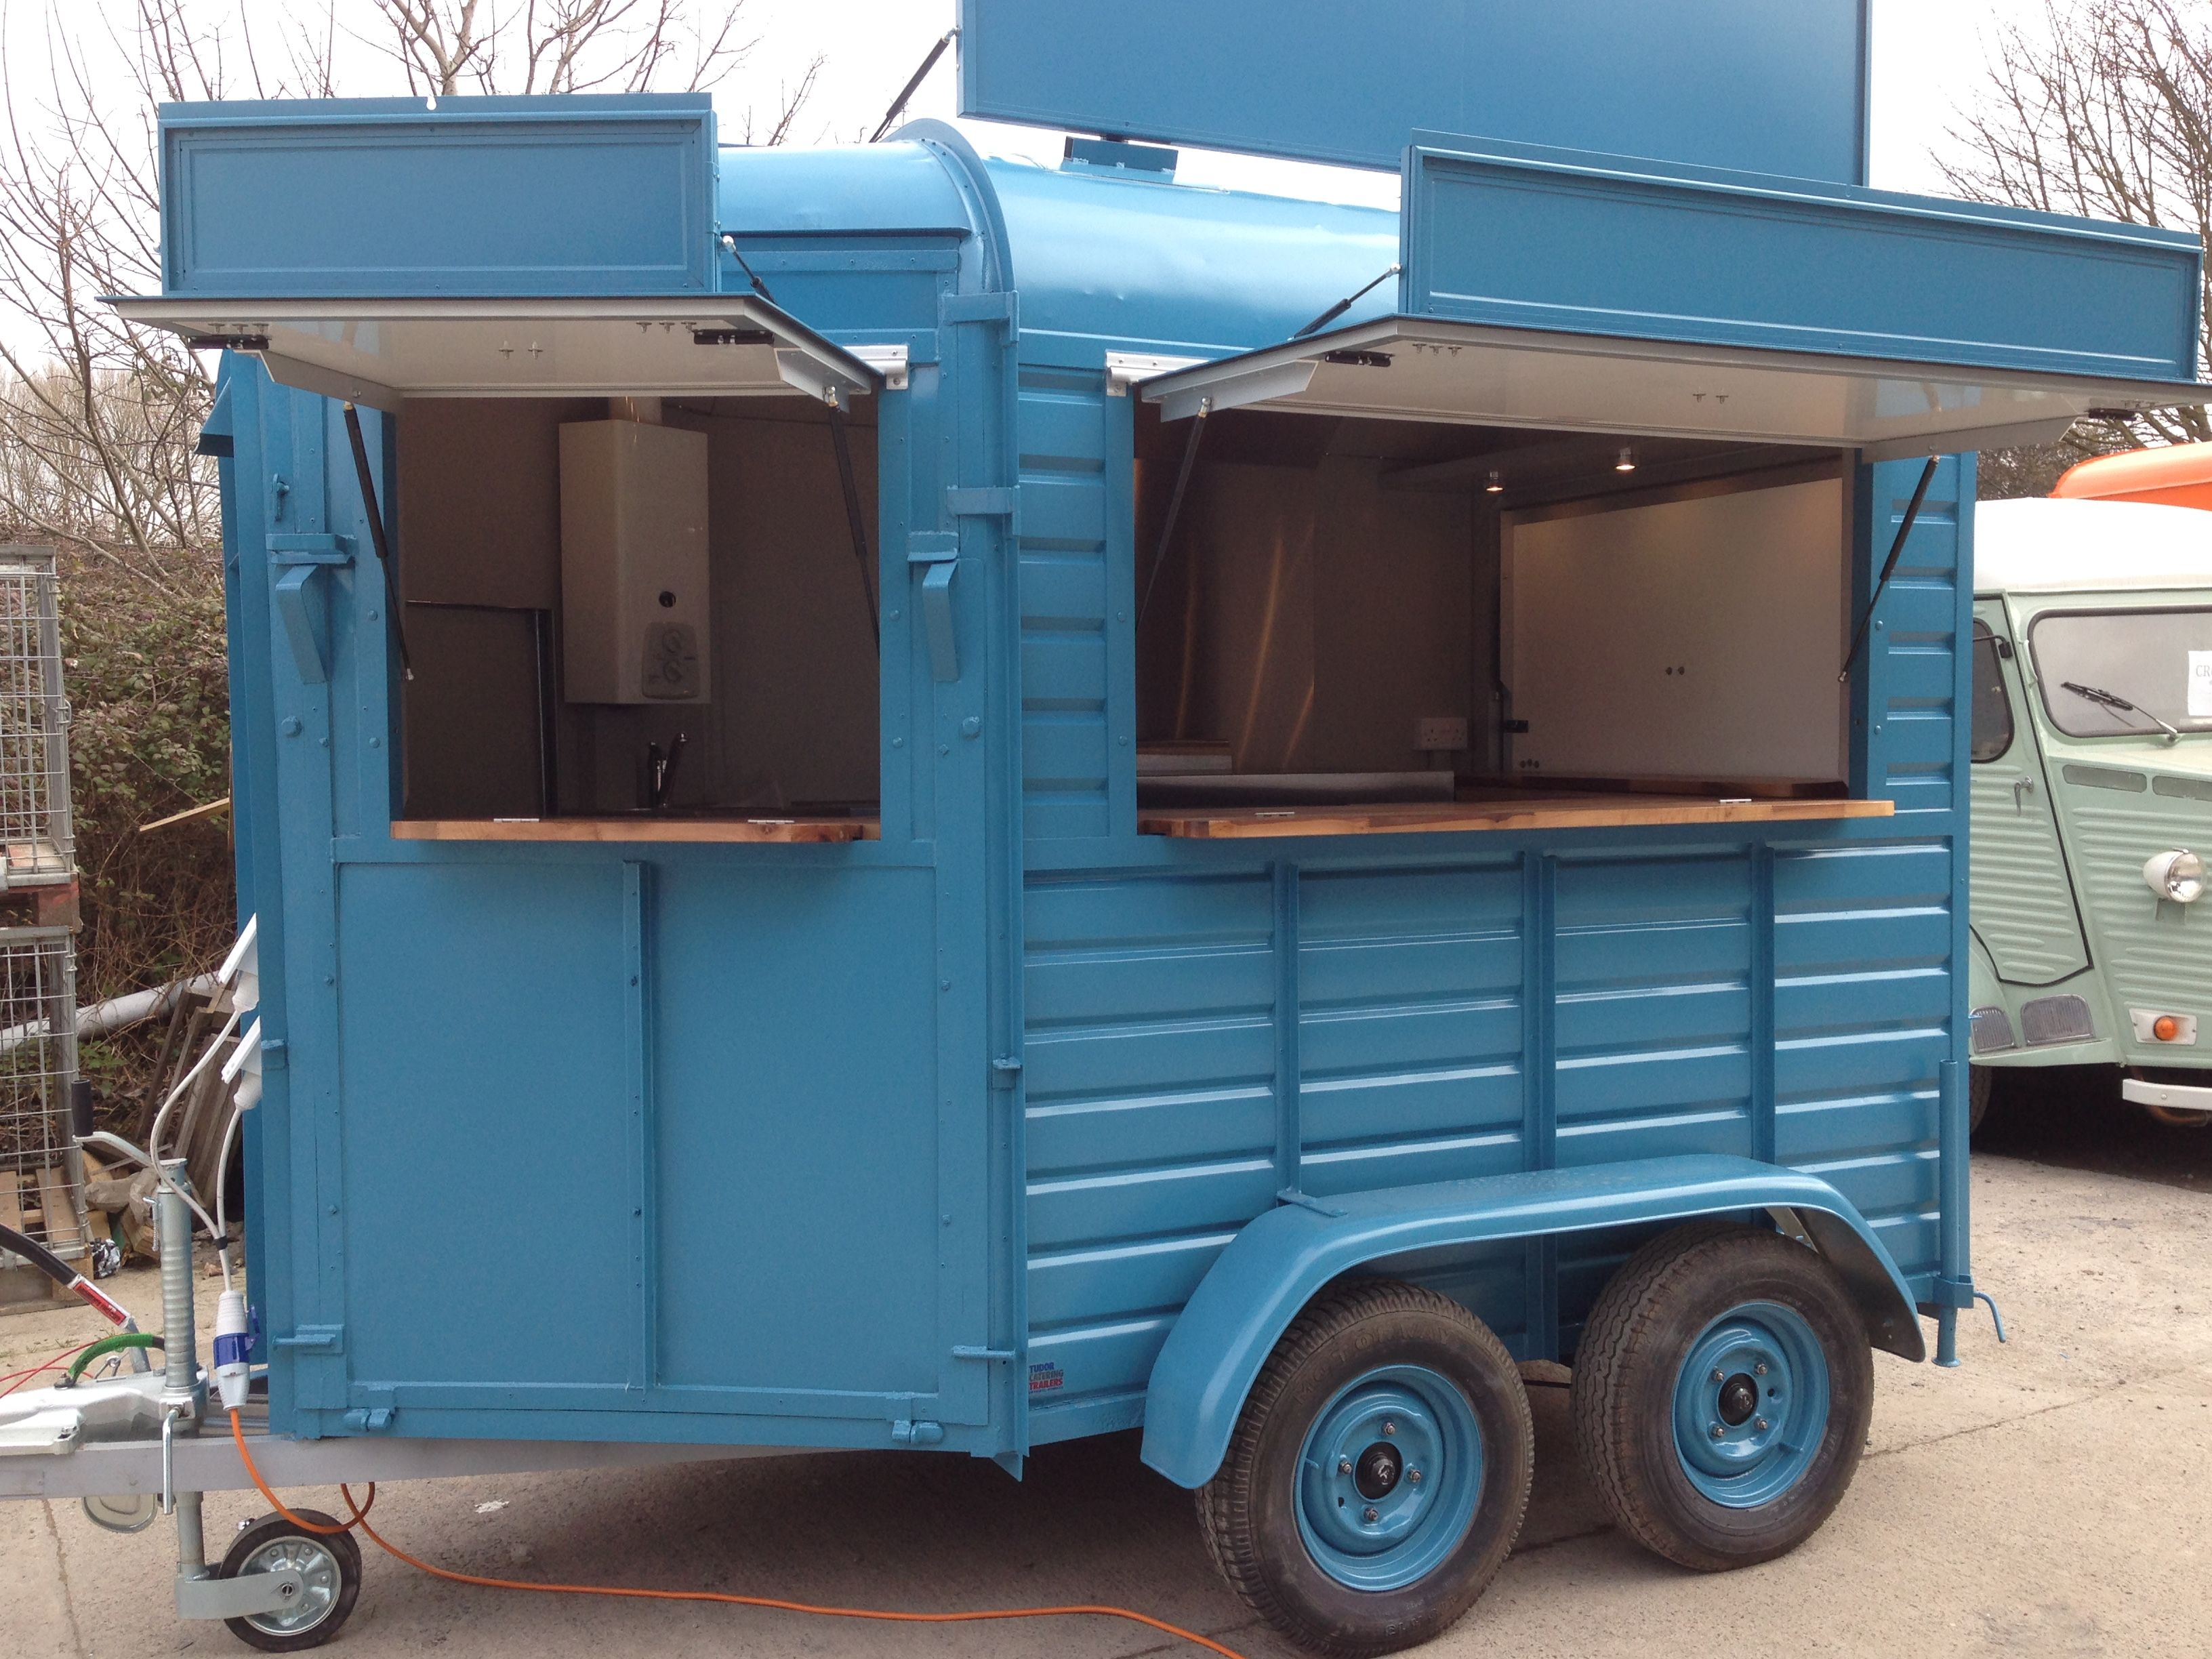 Horse Box Trailer | Coffee Dominates | Pinterest | Food truck, Oven ...